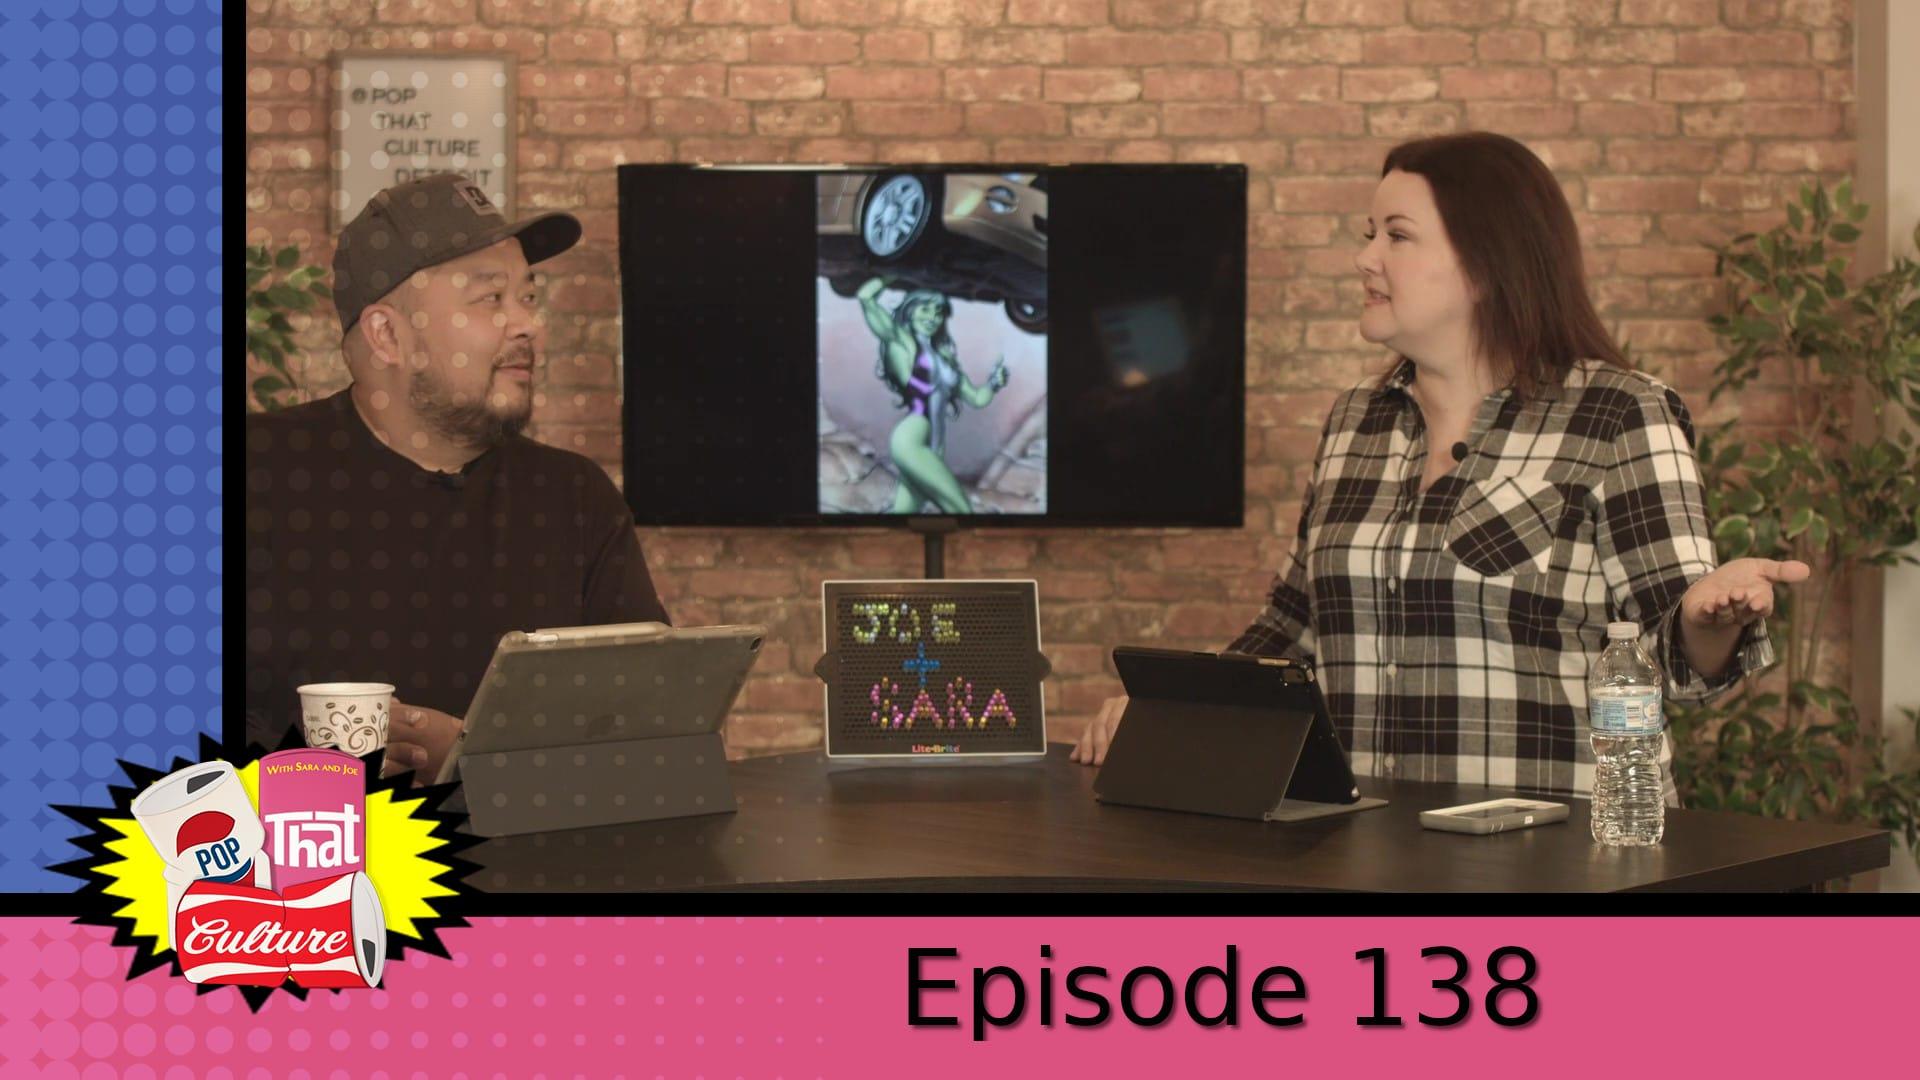 Pop That Culture - Episode 138